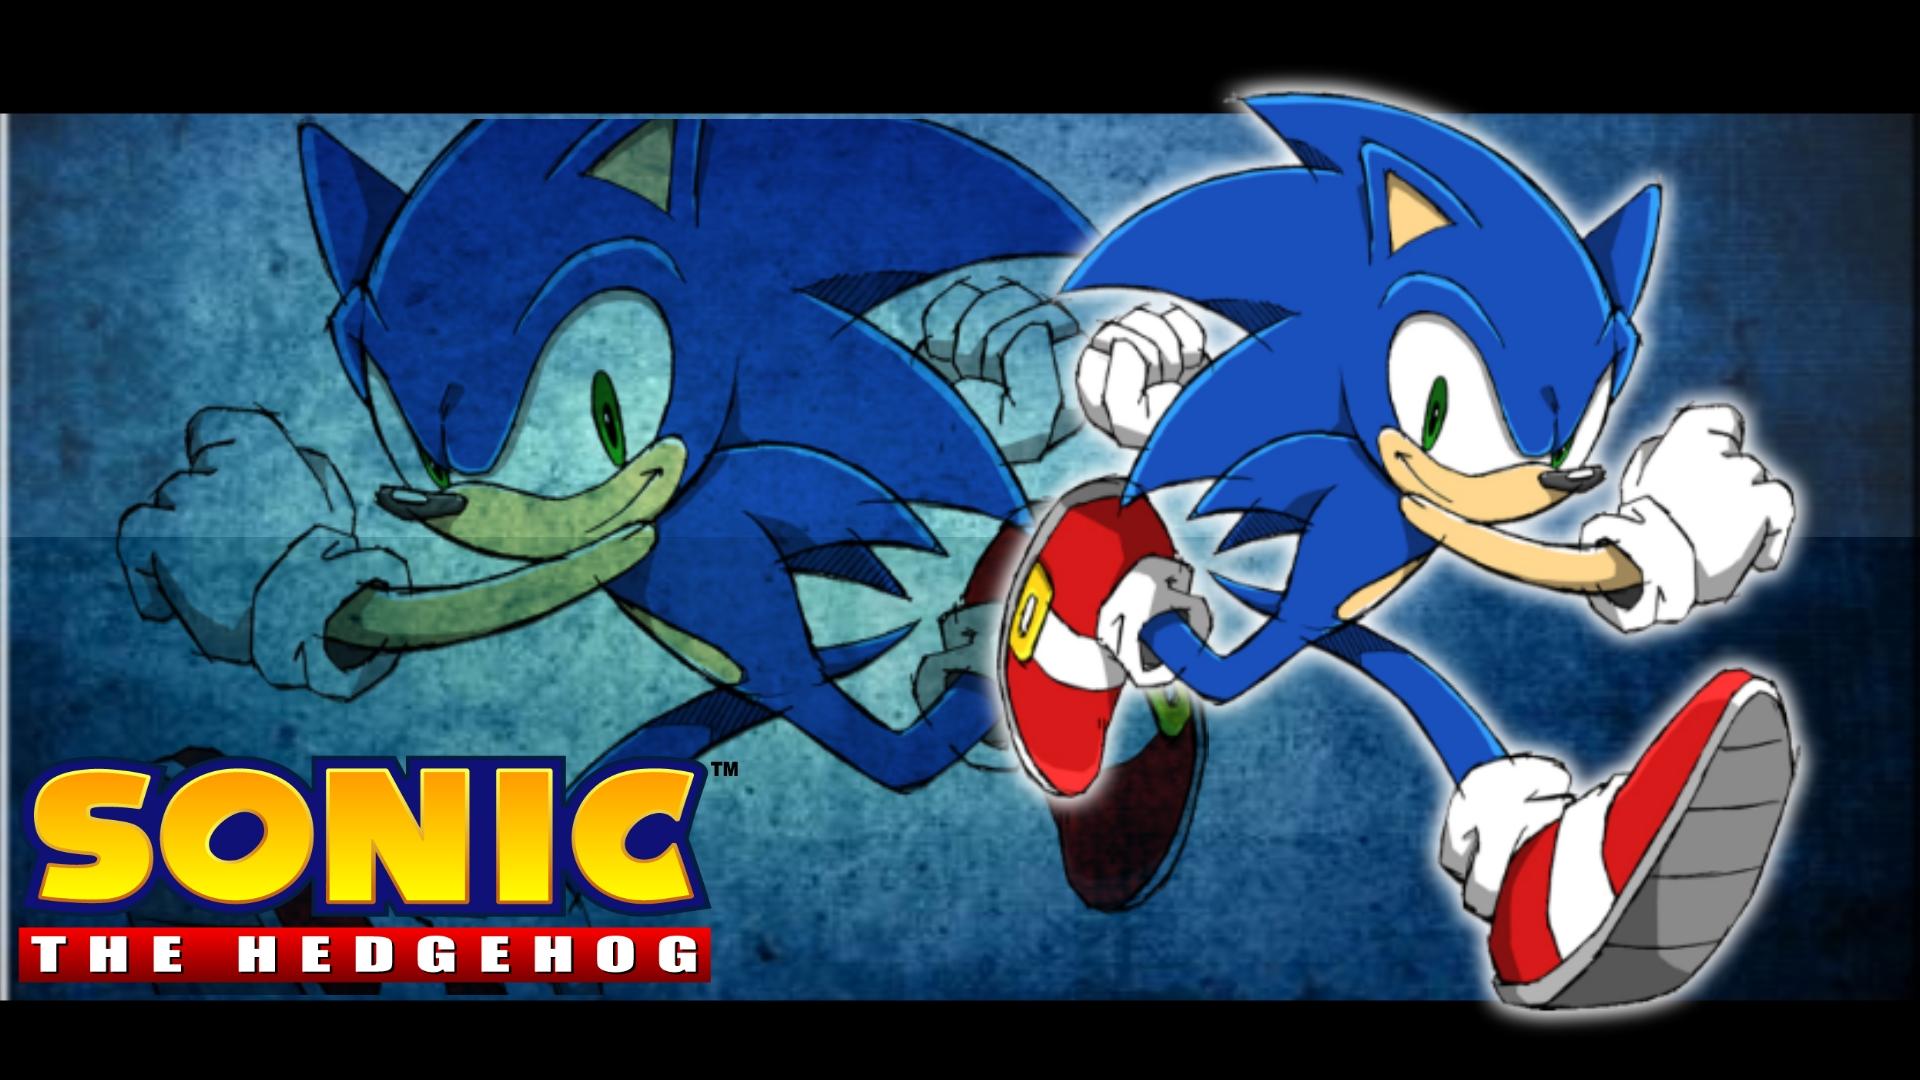 Sonic The Hedgehog Wallpaper 2 By Bluespeed360 On Deviantart